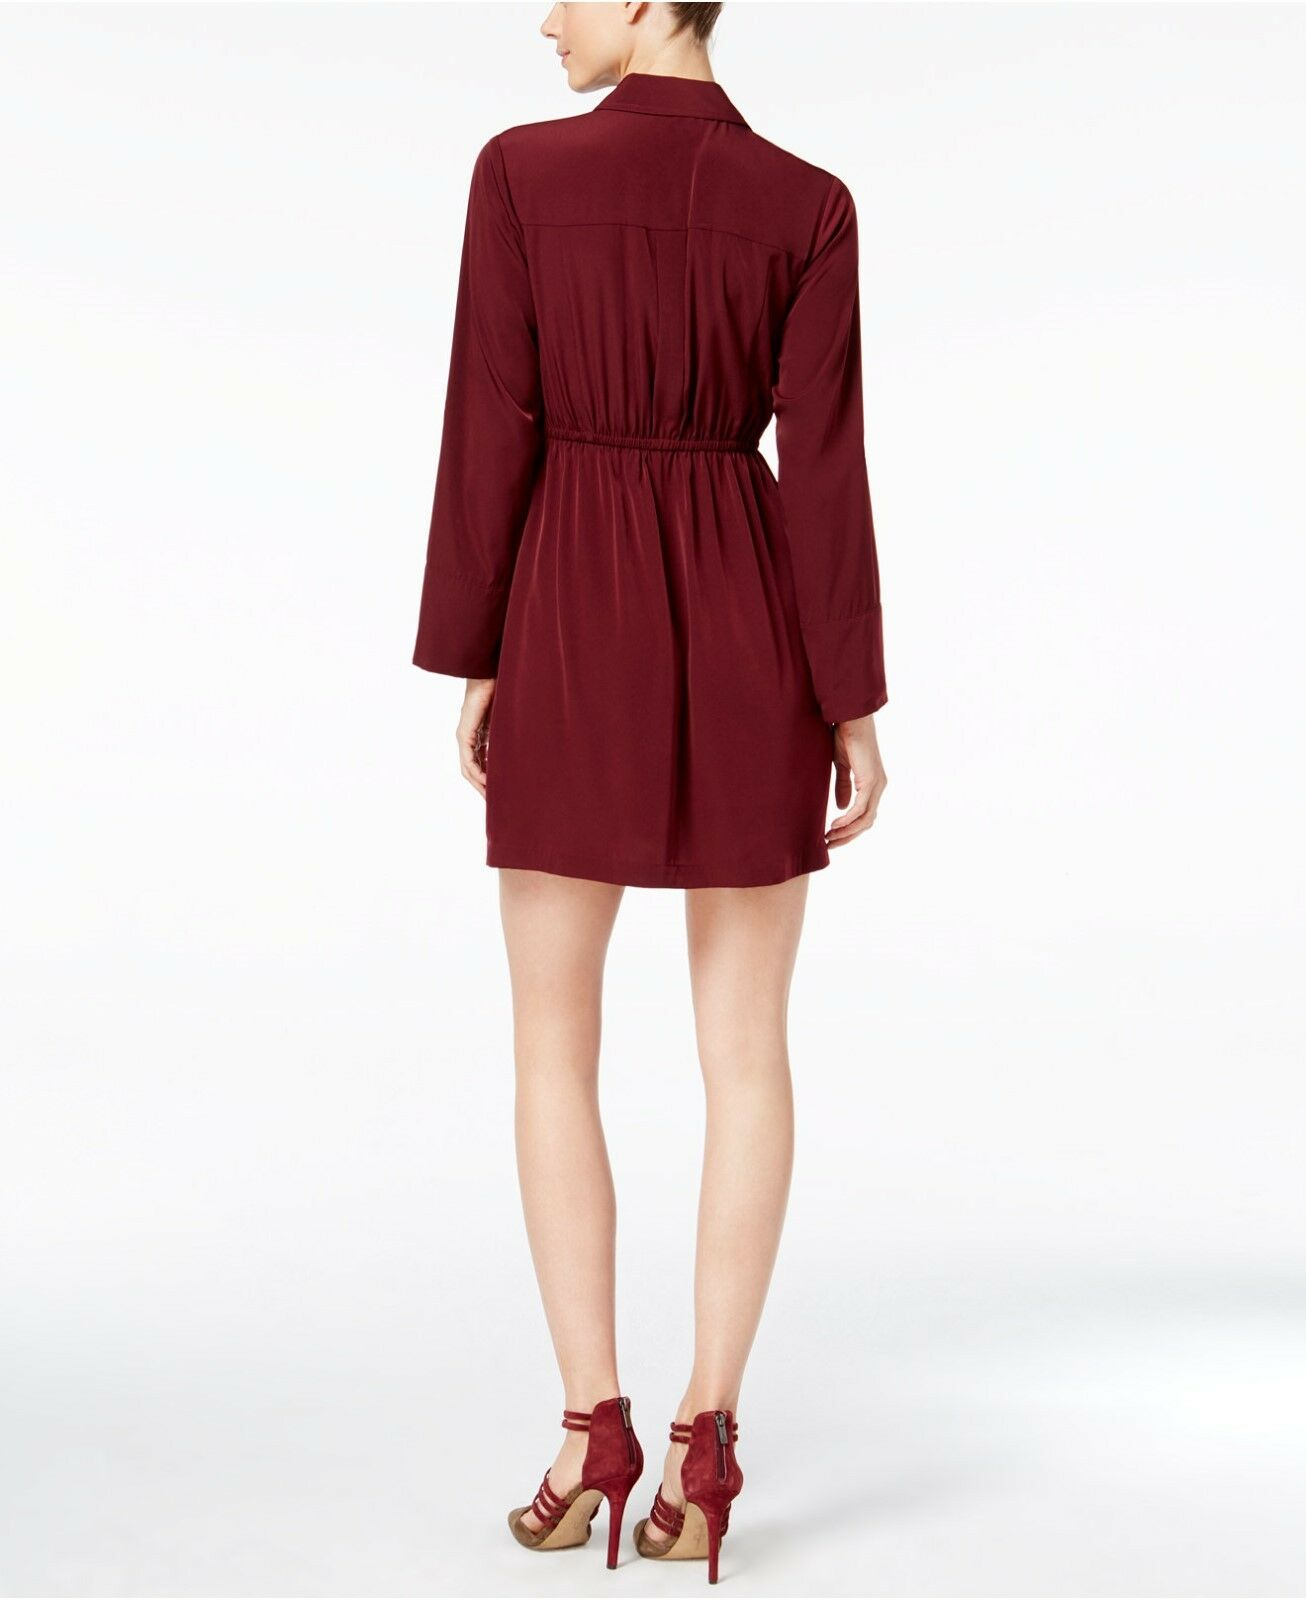 Alfani nueva utilidad de cuello en V V V manga larga vestido rojo 2 84b16b